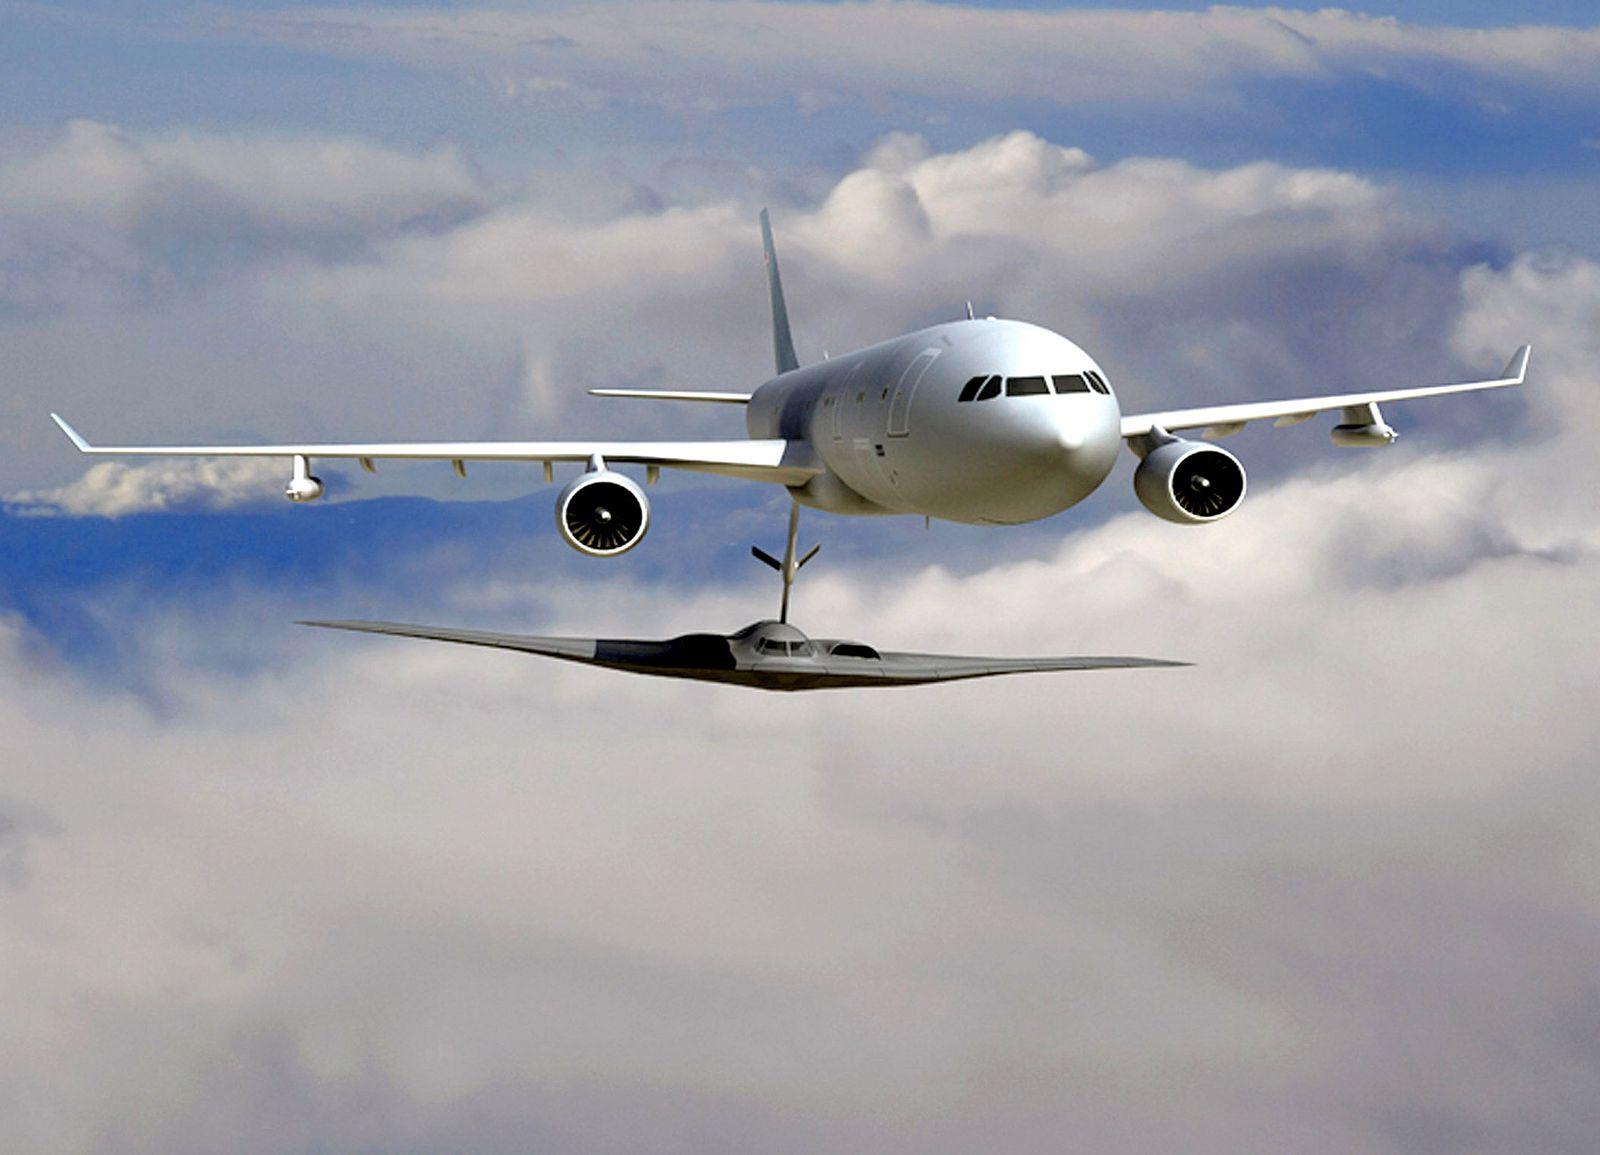 FRANCE-US-AEROSPACE-DEFENCE-REFUELING-EADS-BOEING